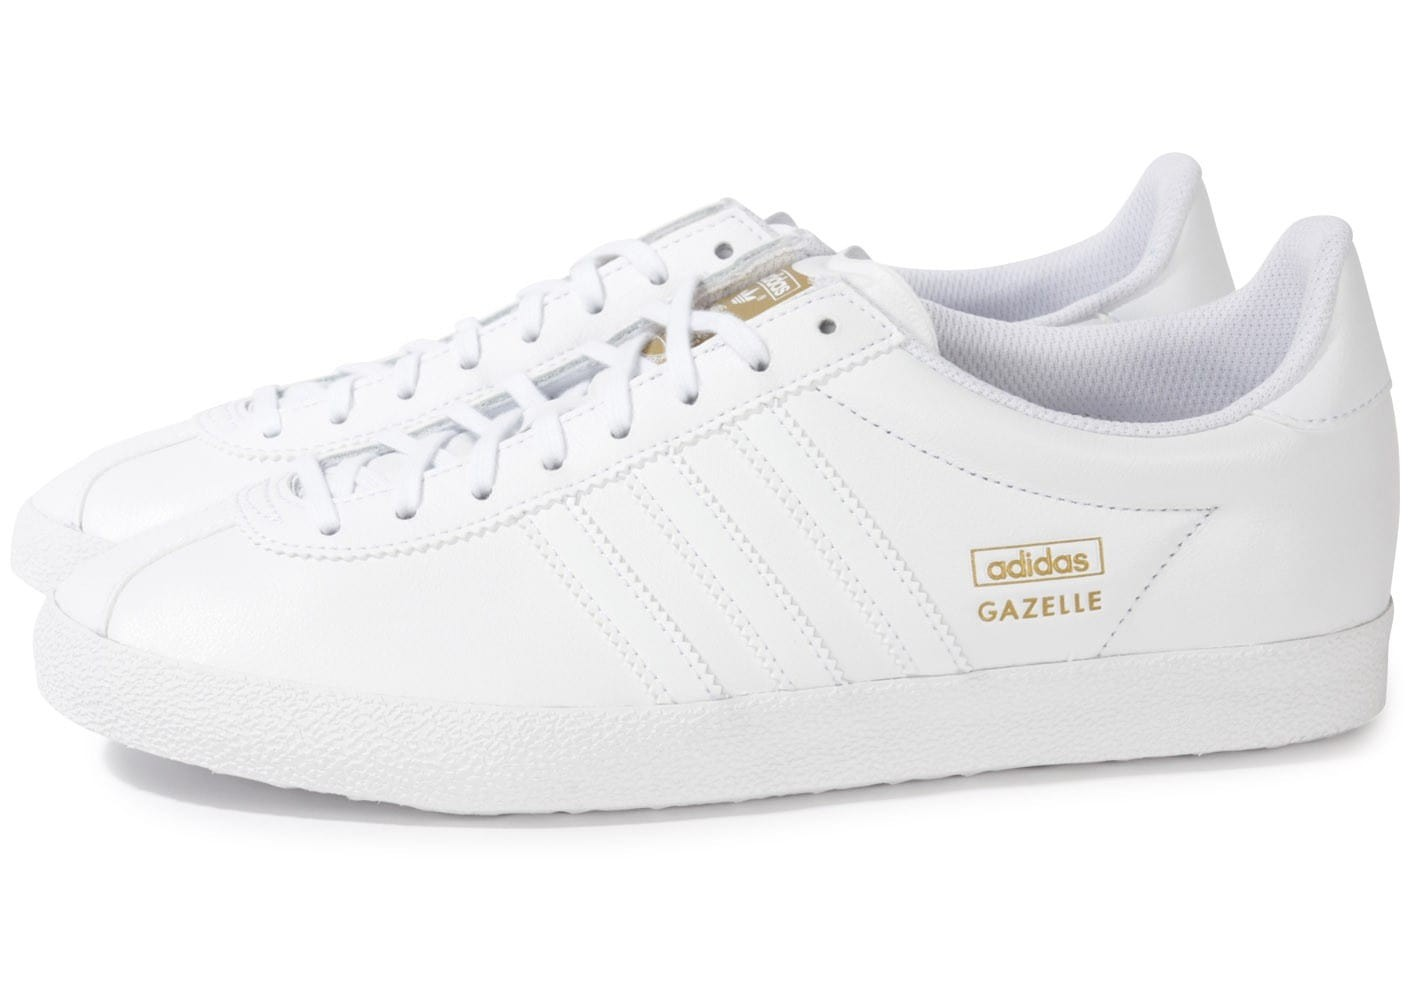 adidas gazelle cuir pas cher